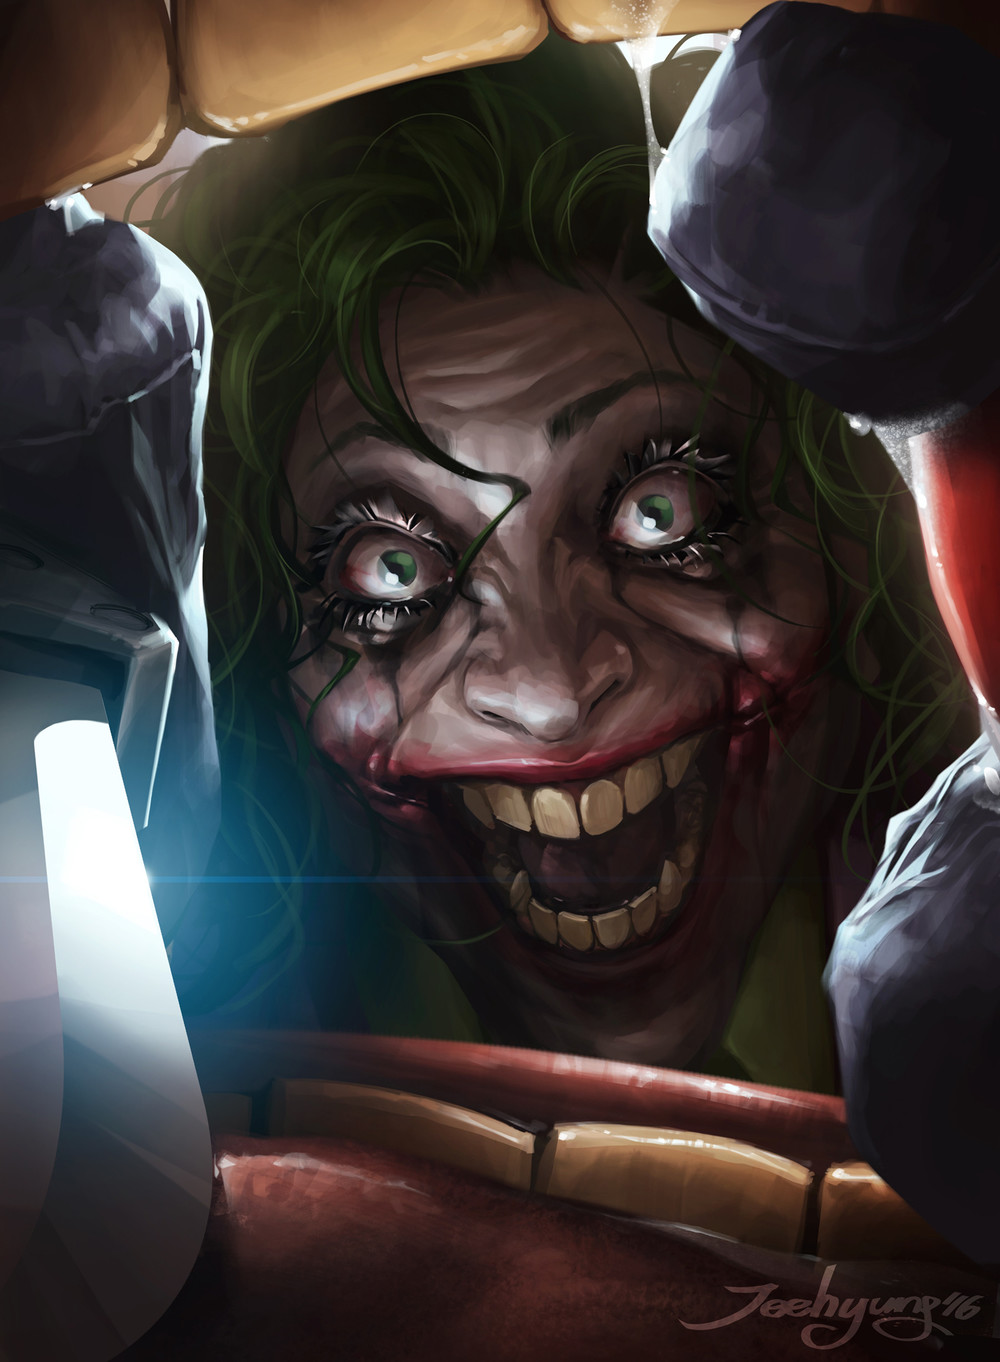 Terrifying Art of Martha Wayne as The Joker from Flashpoint ...